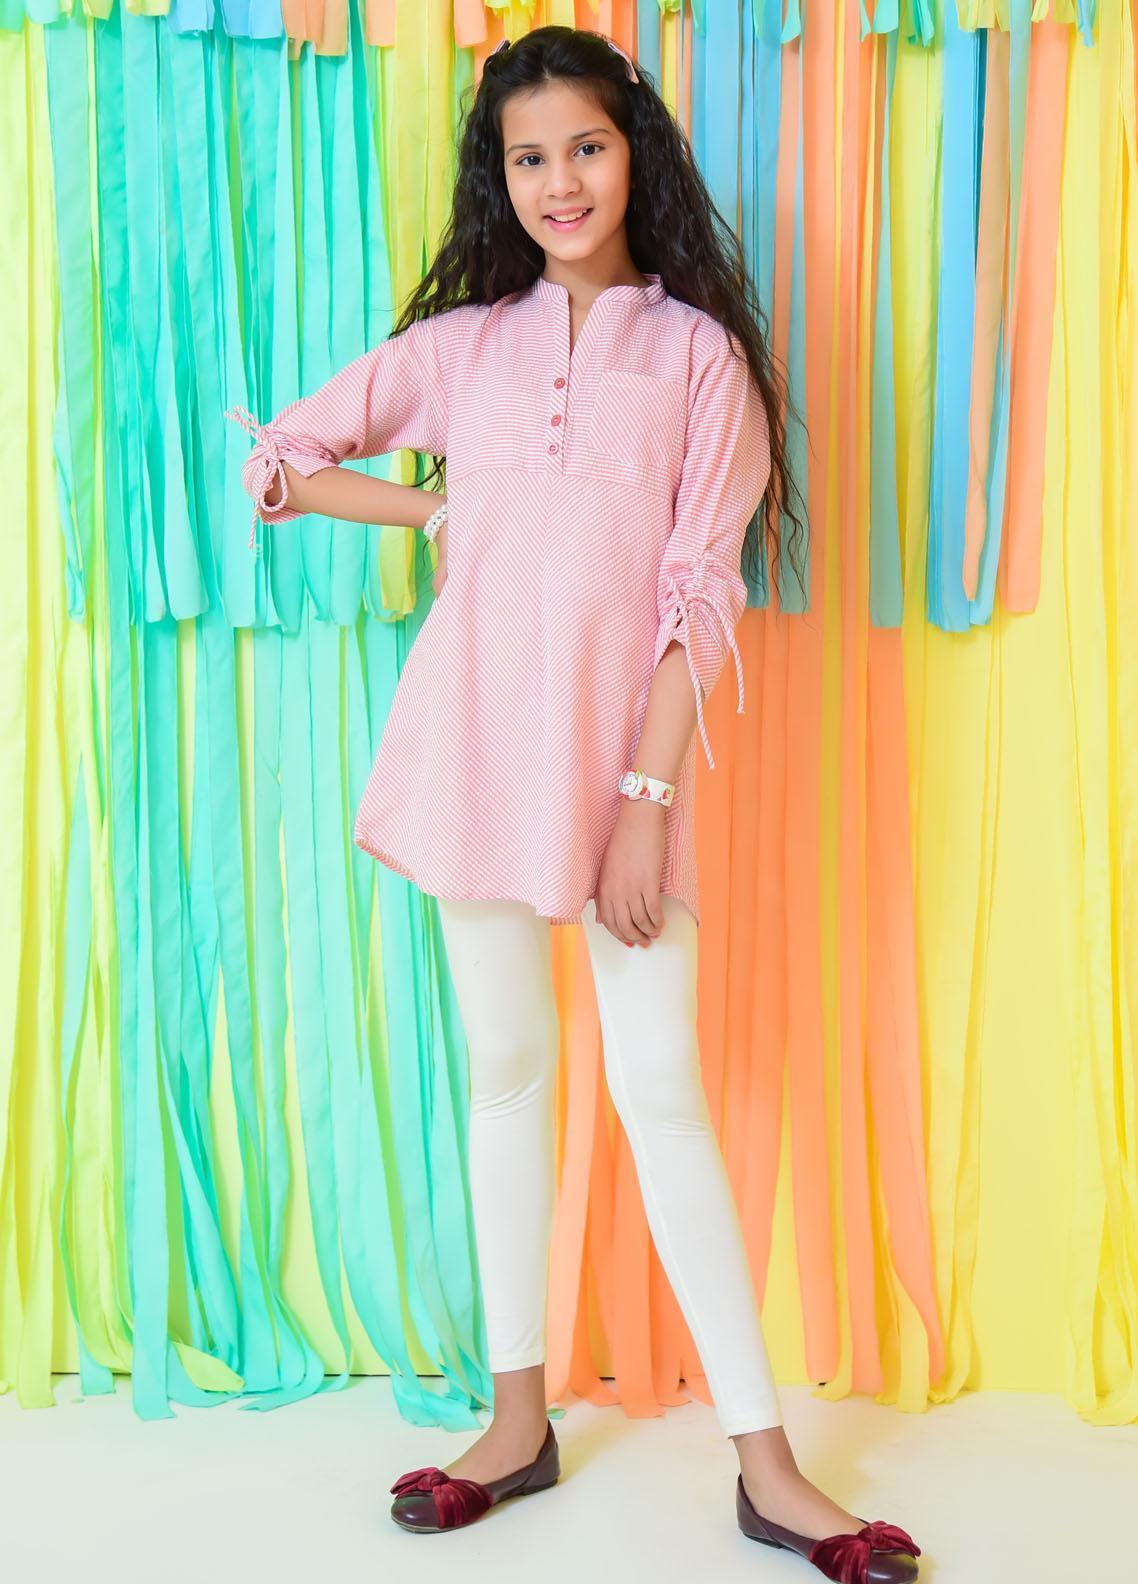 Ochre Cotton Fancy Western Top for Girls -  OWT-446 Peach